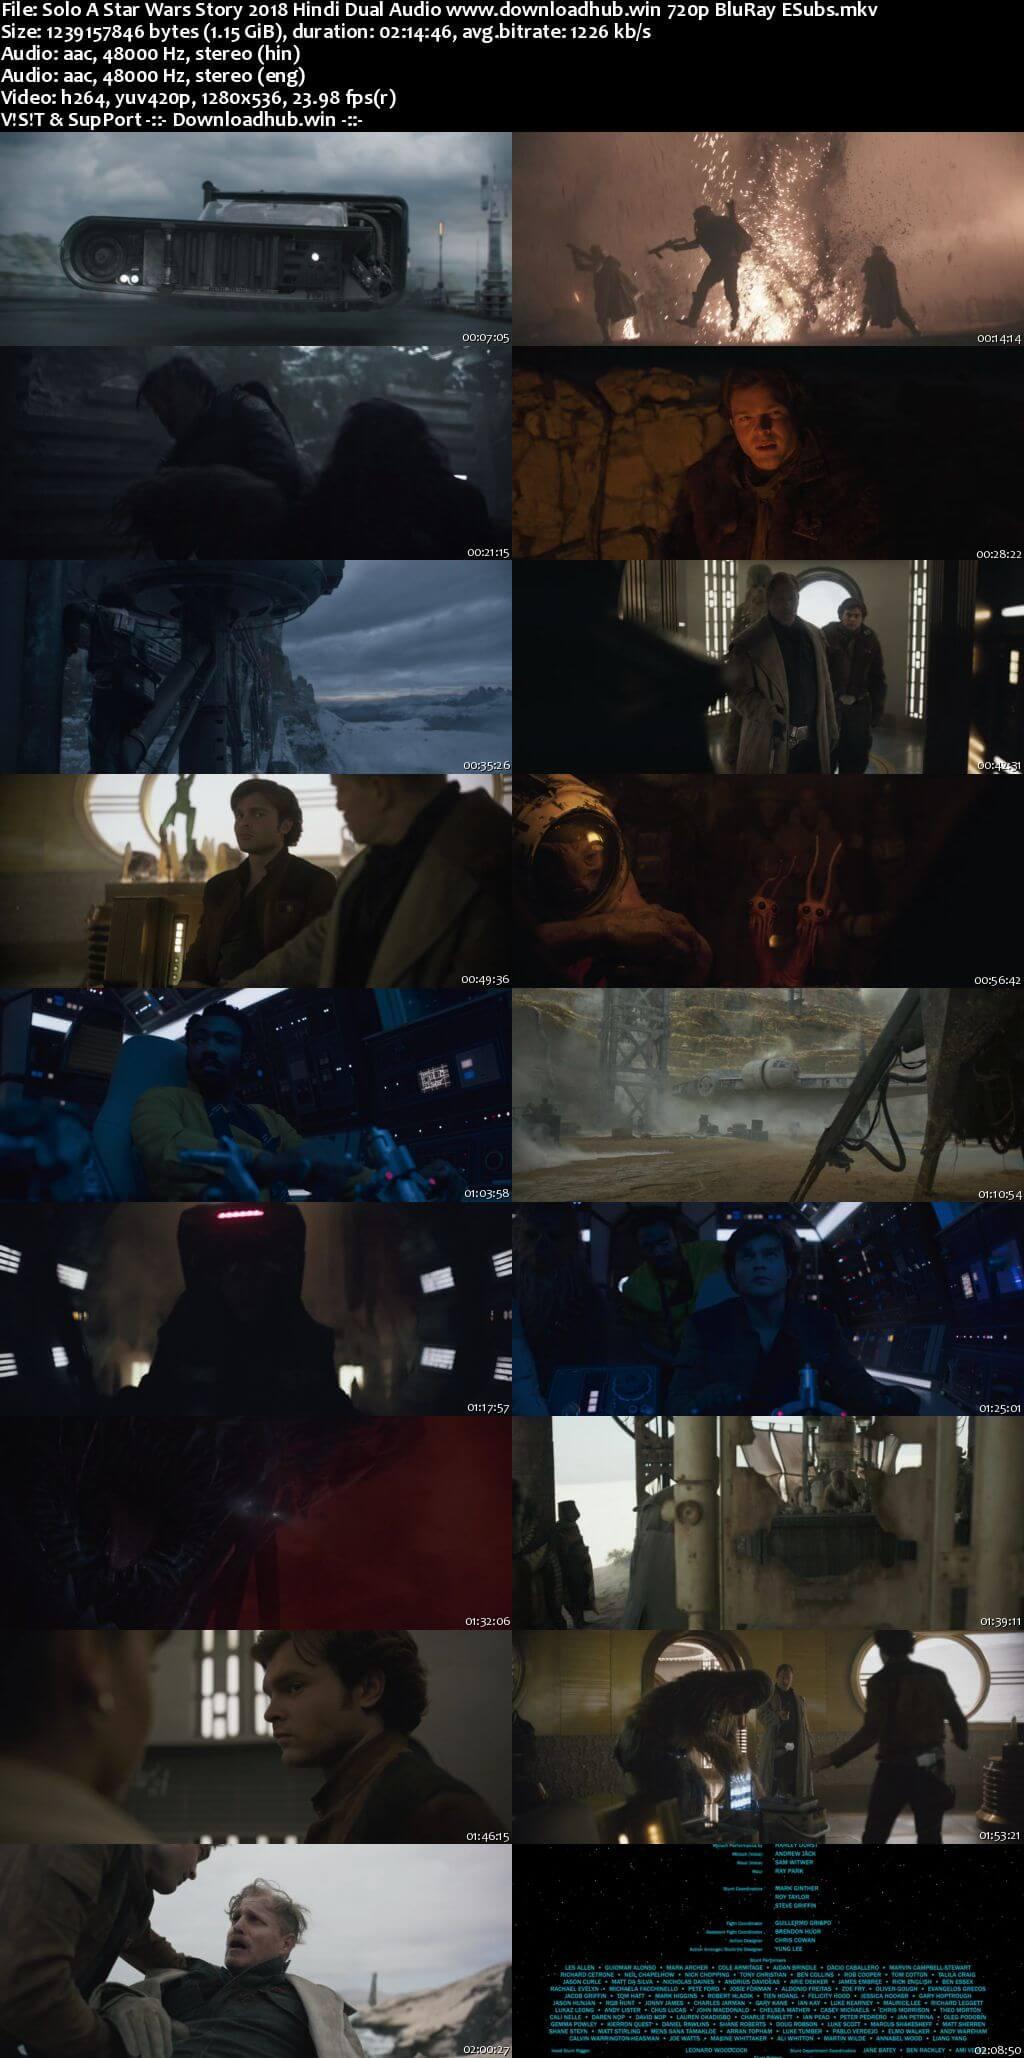 Solo A Star Wars Story 2018 Hindi Dual Audio 720p BluRay ESubs